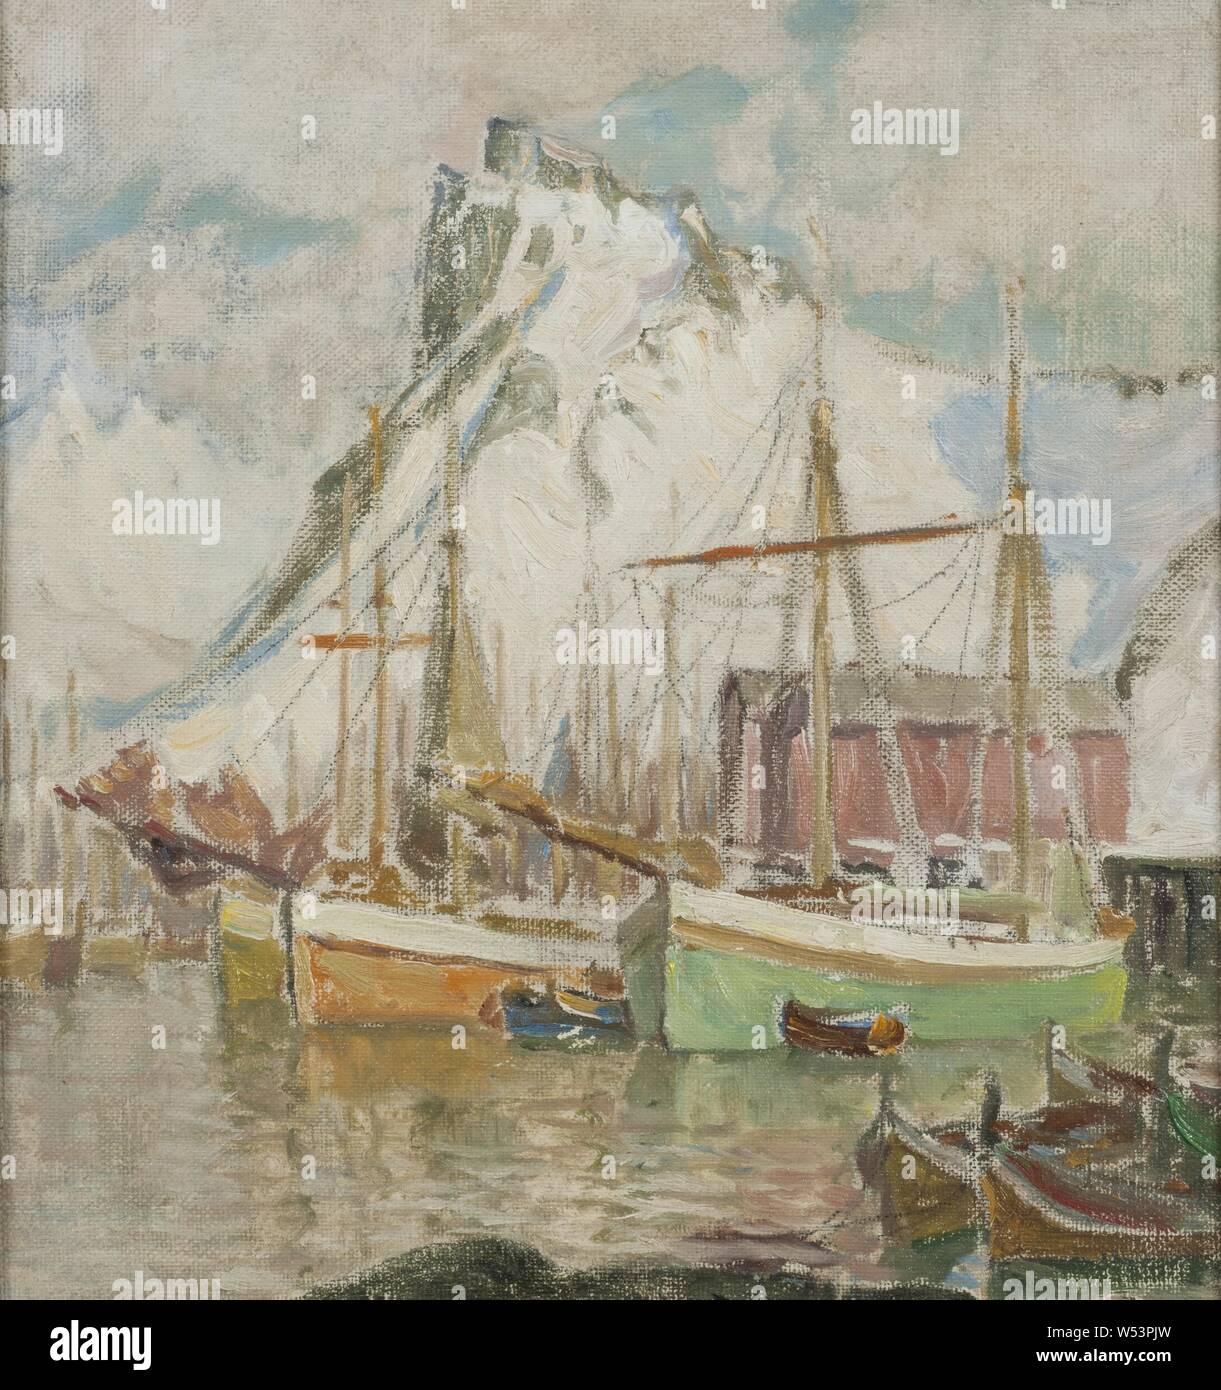 Anna Boberg, In the Harbor, Svolvaer, Study from Lofoten, I